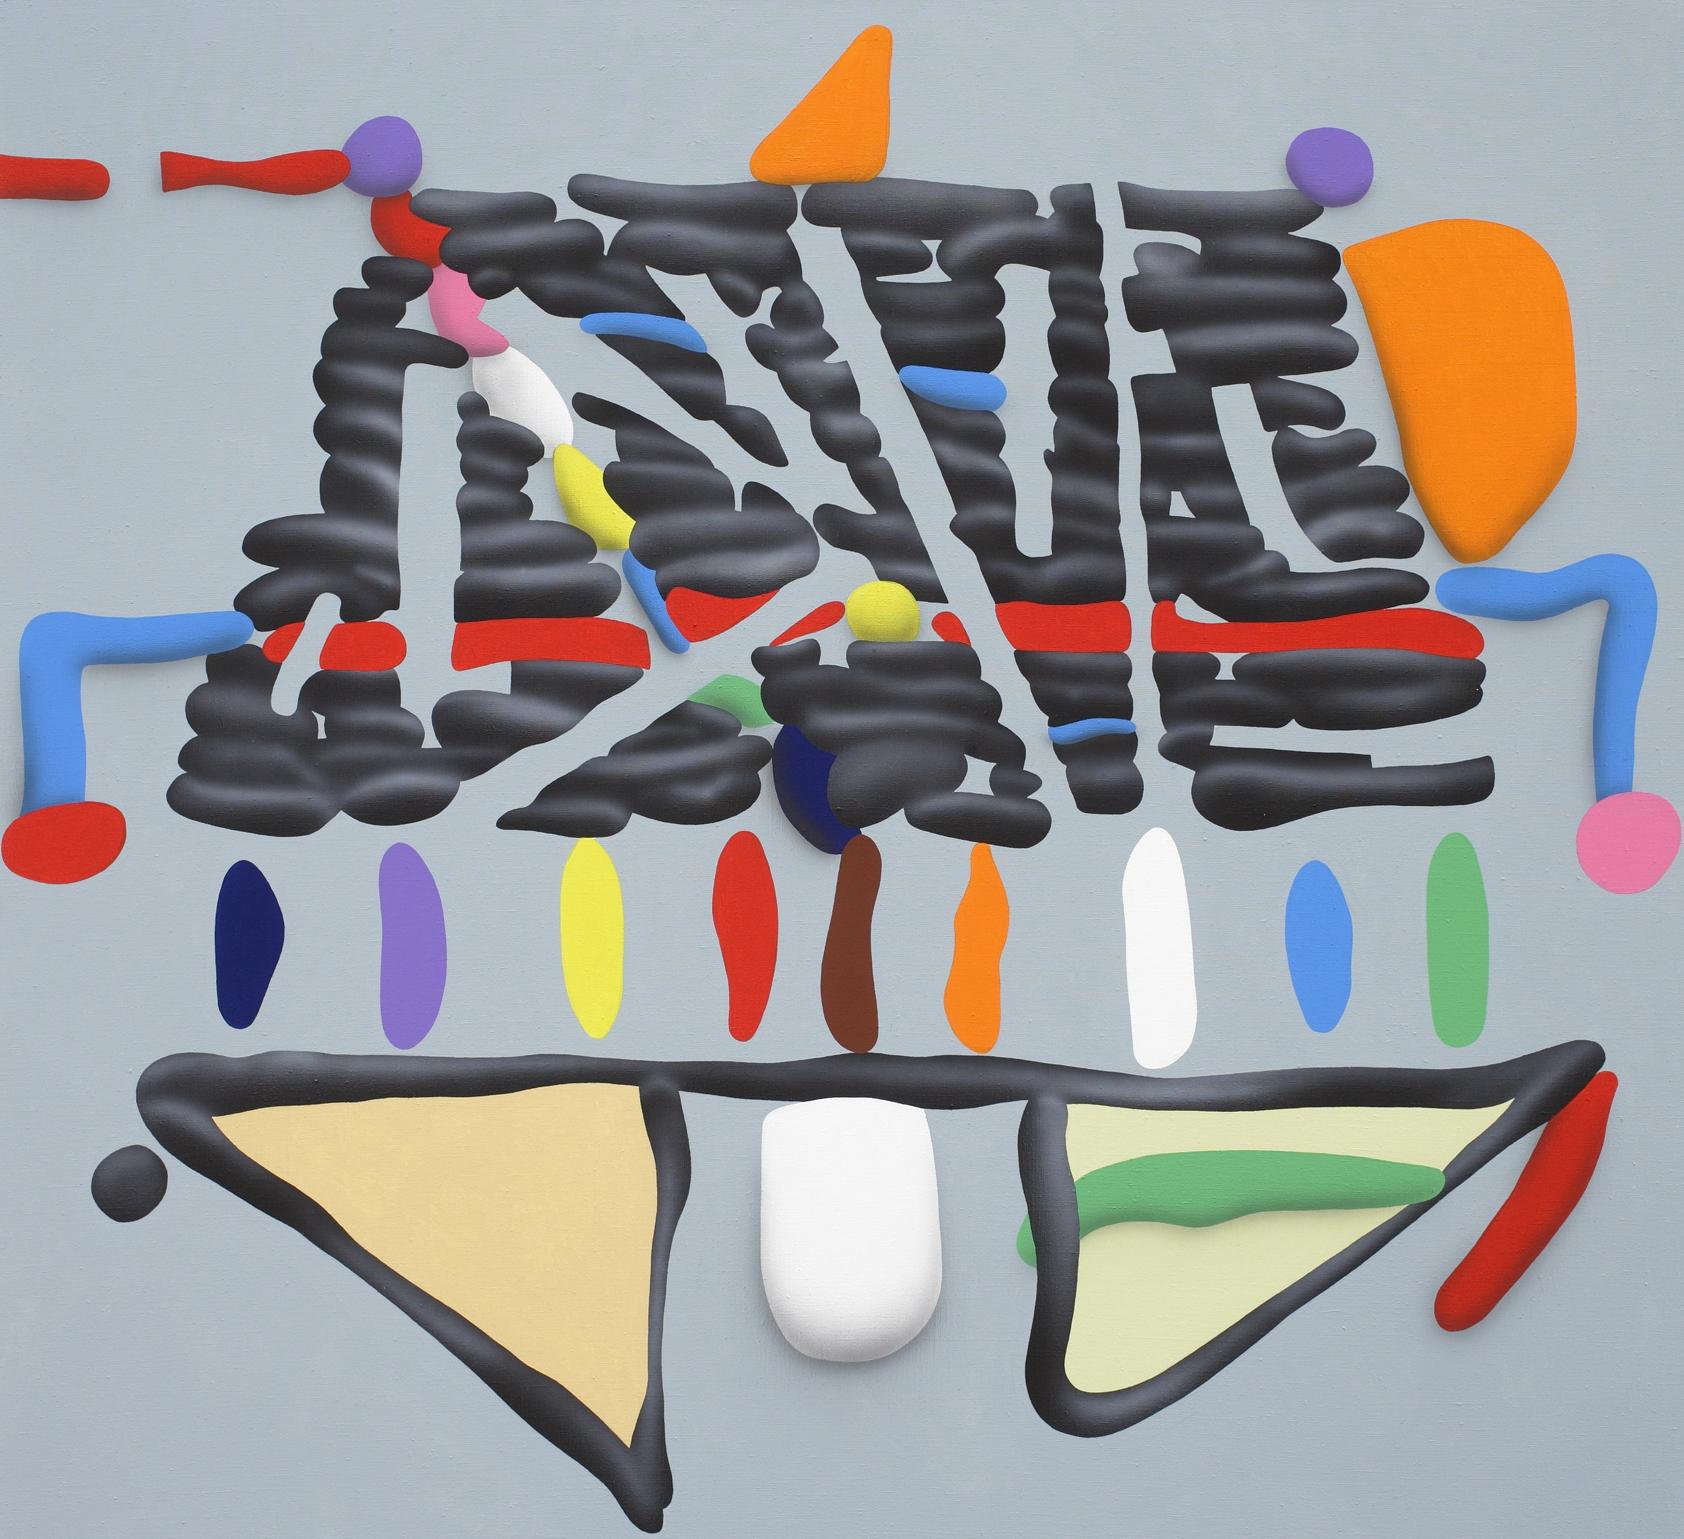 Pentagon, 2010, acrylic on canvas, 120 x 140 cm